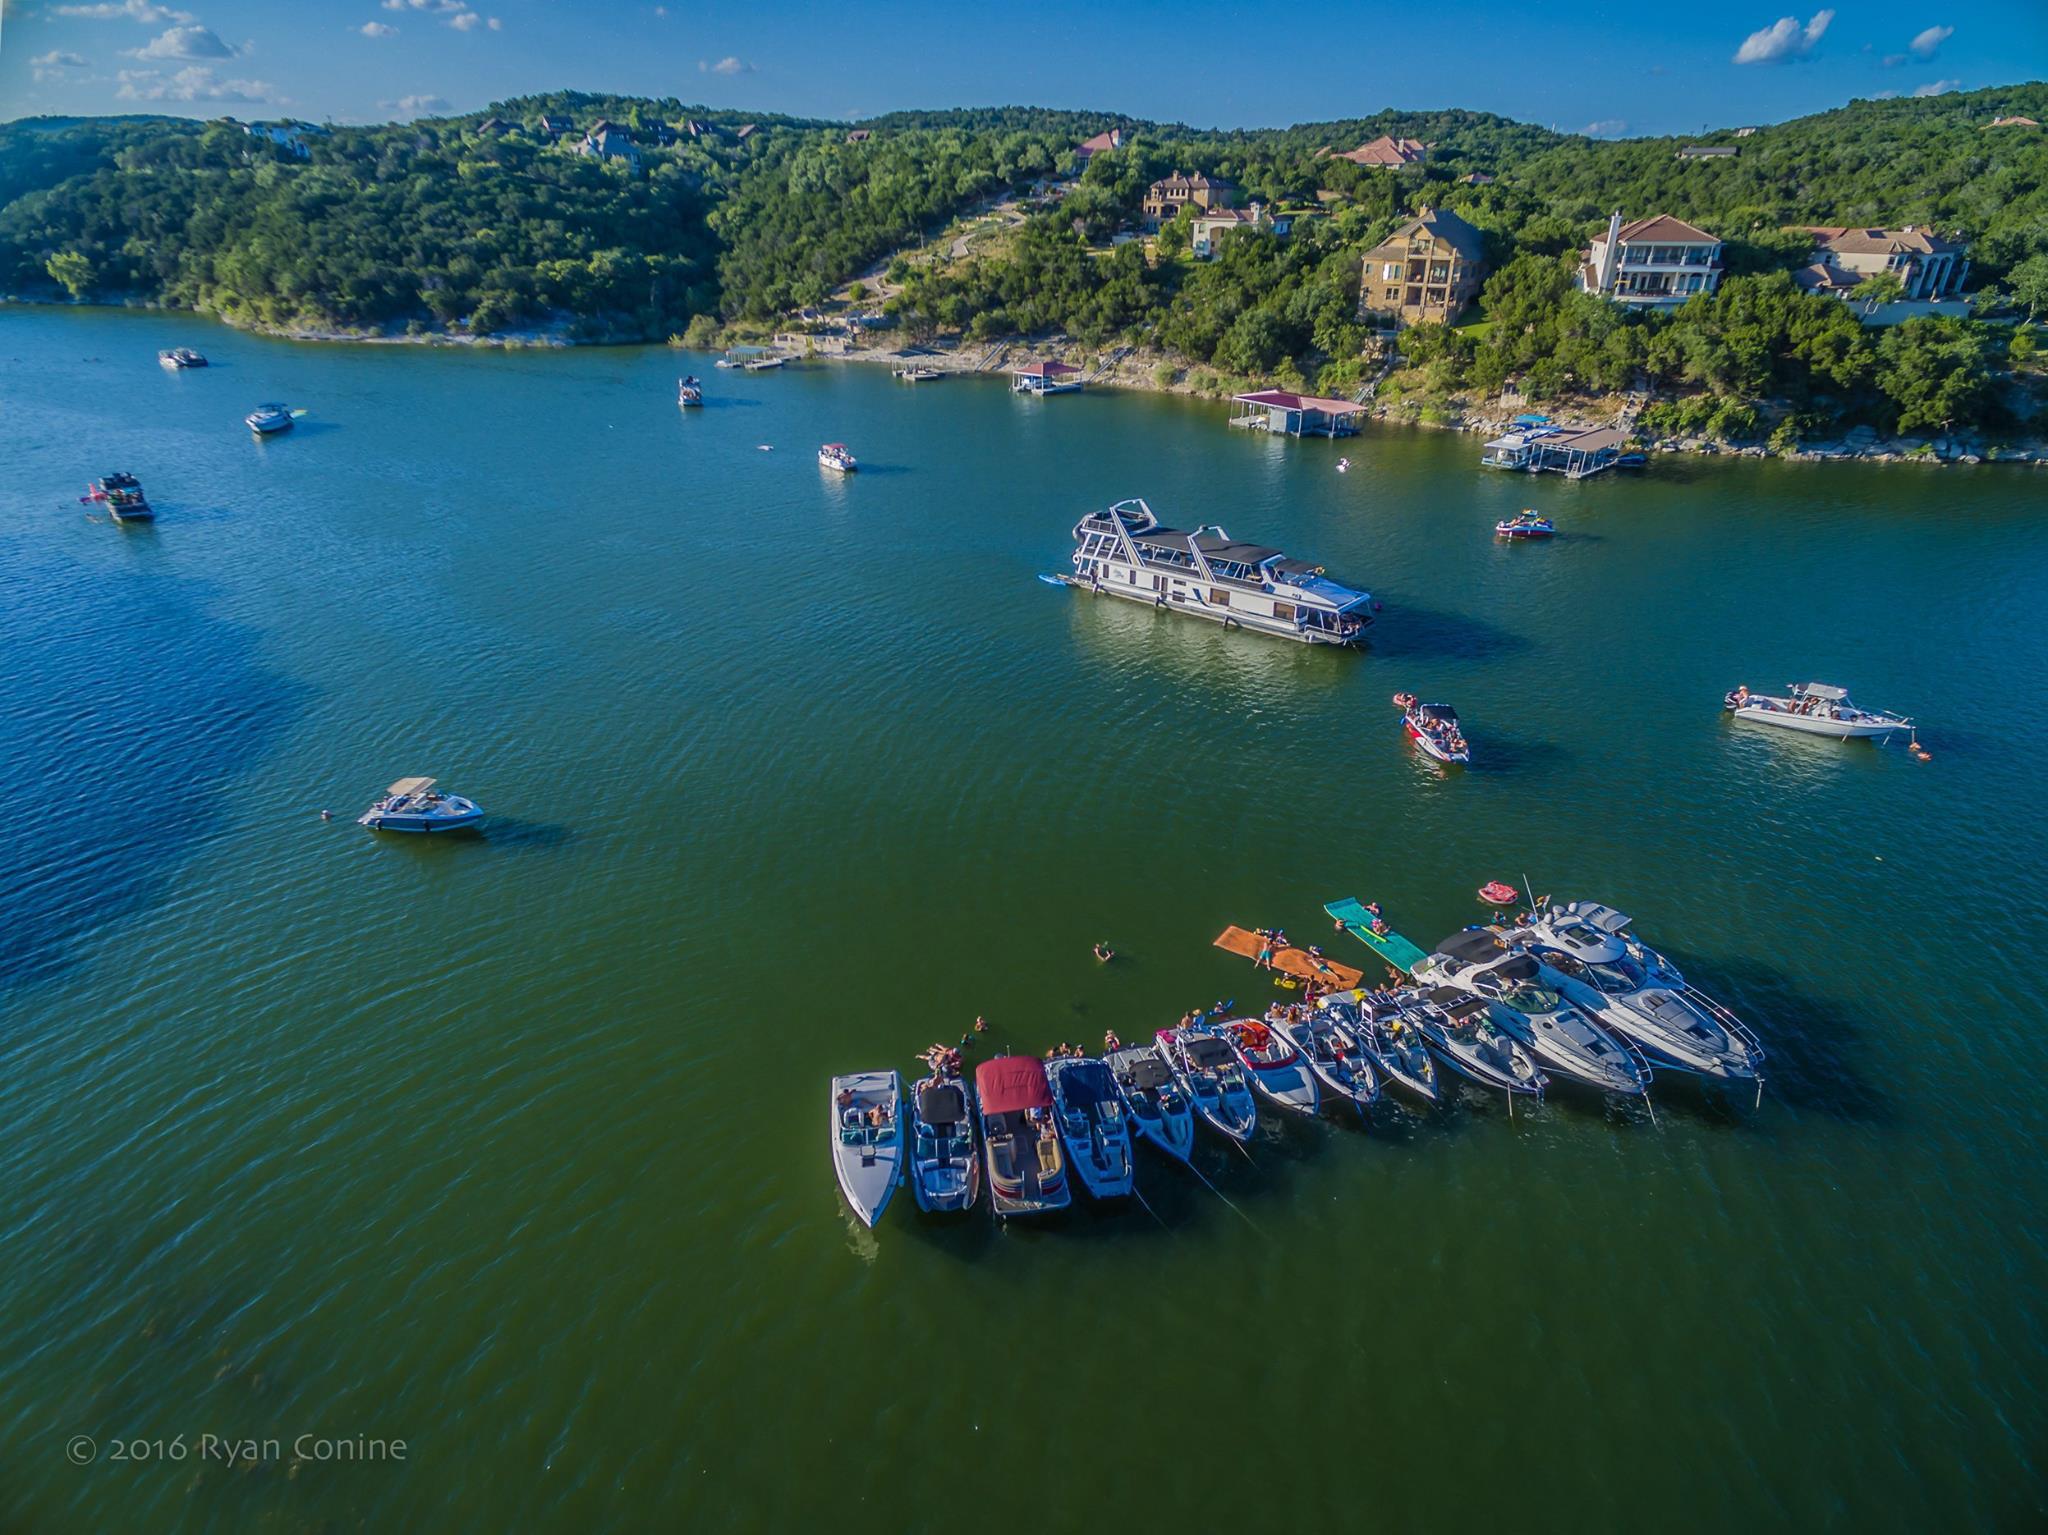 Devil's Cove - Lake Travis - Ryan Conine Photo